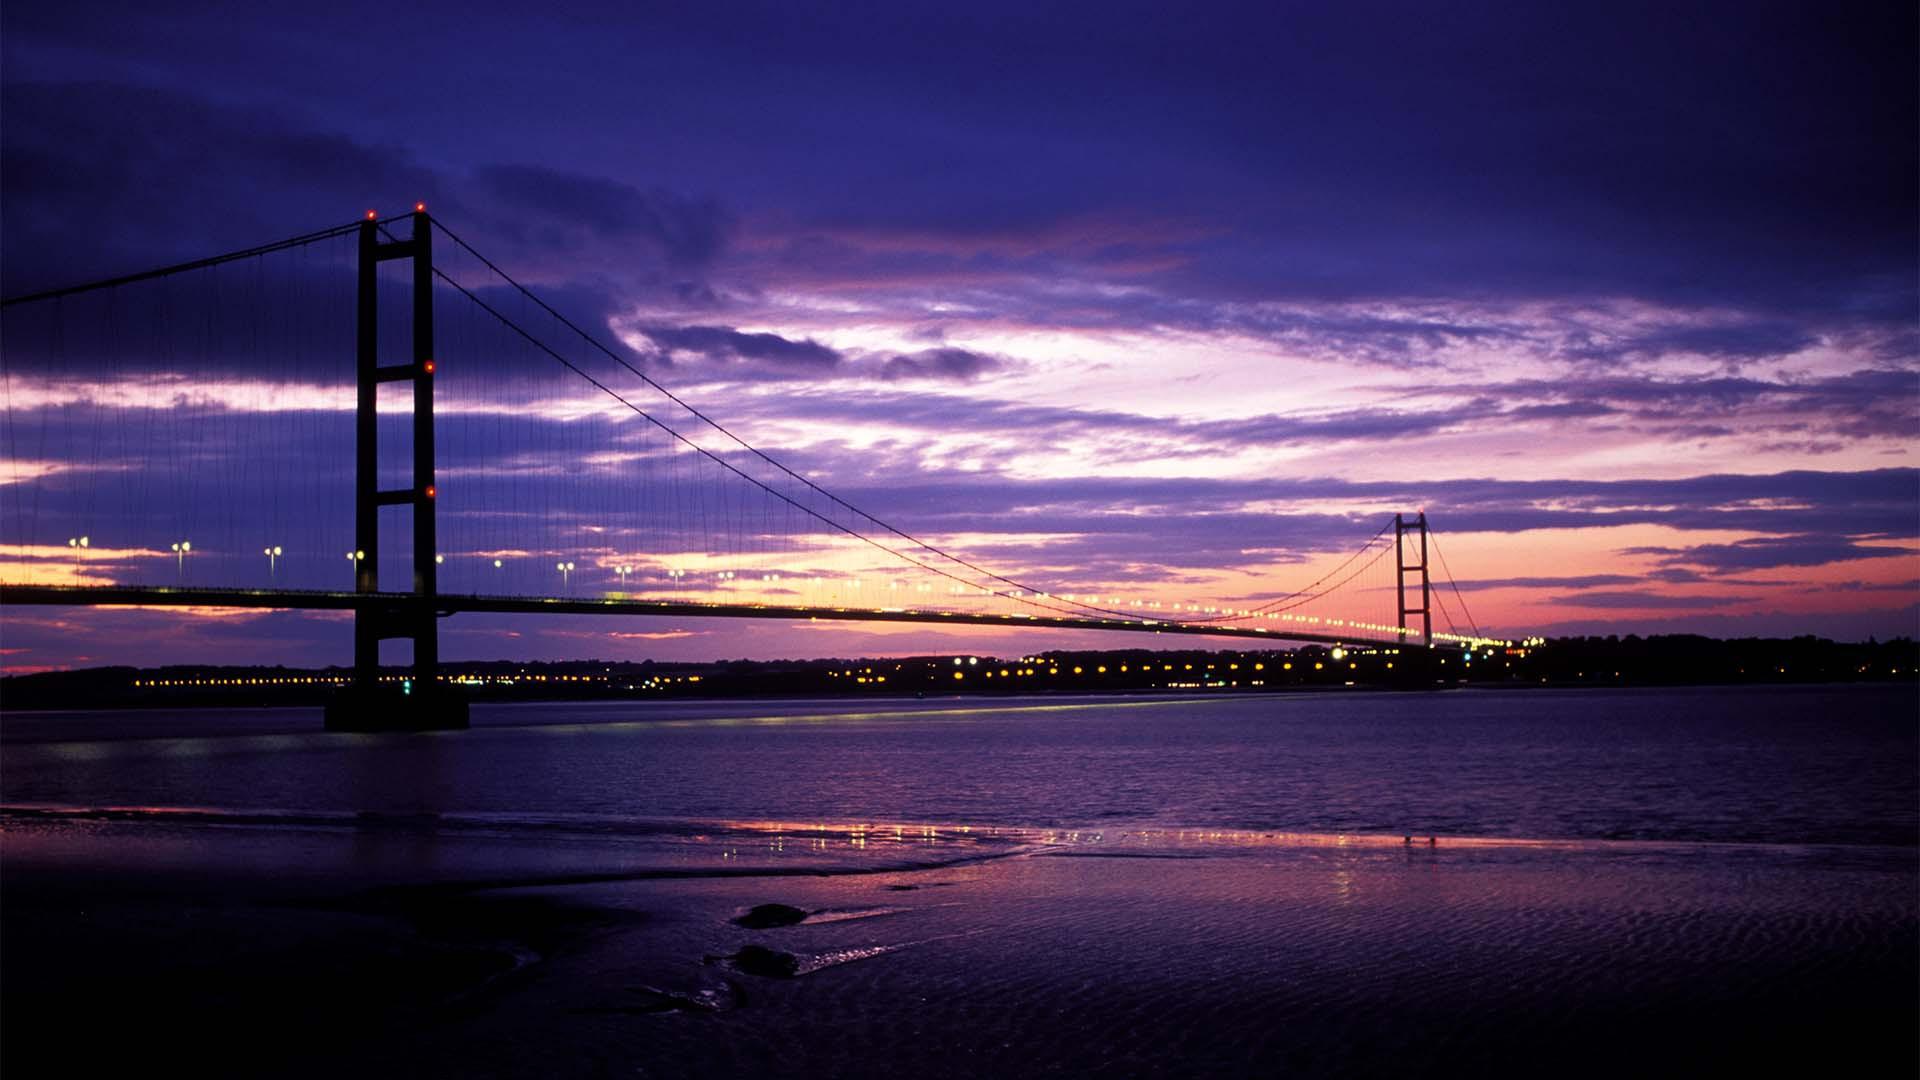 A photograph of Humber Bridge in Hull, at dusk.